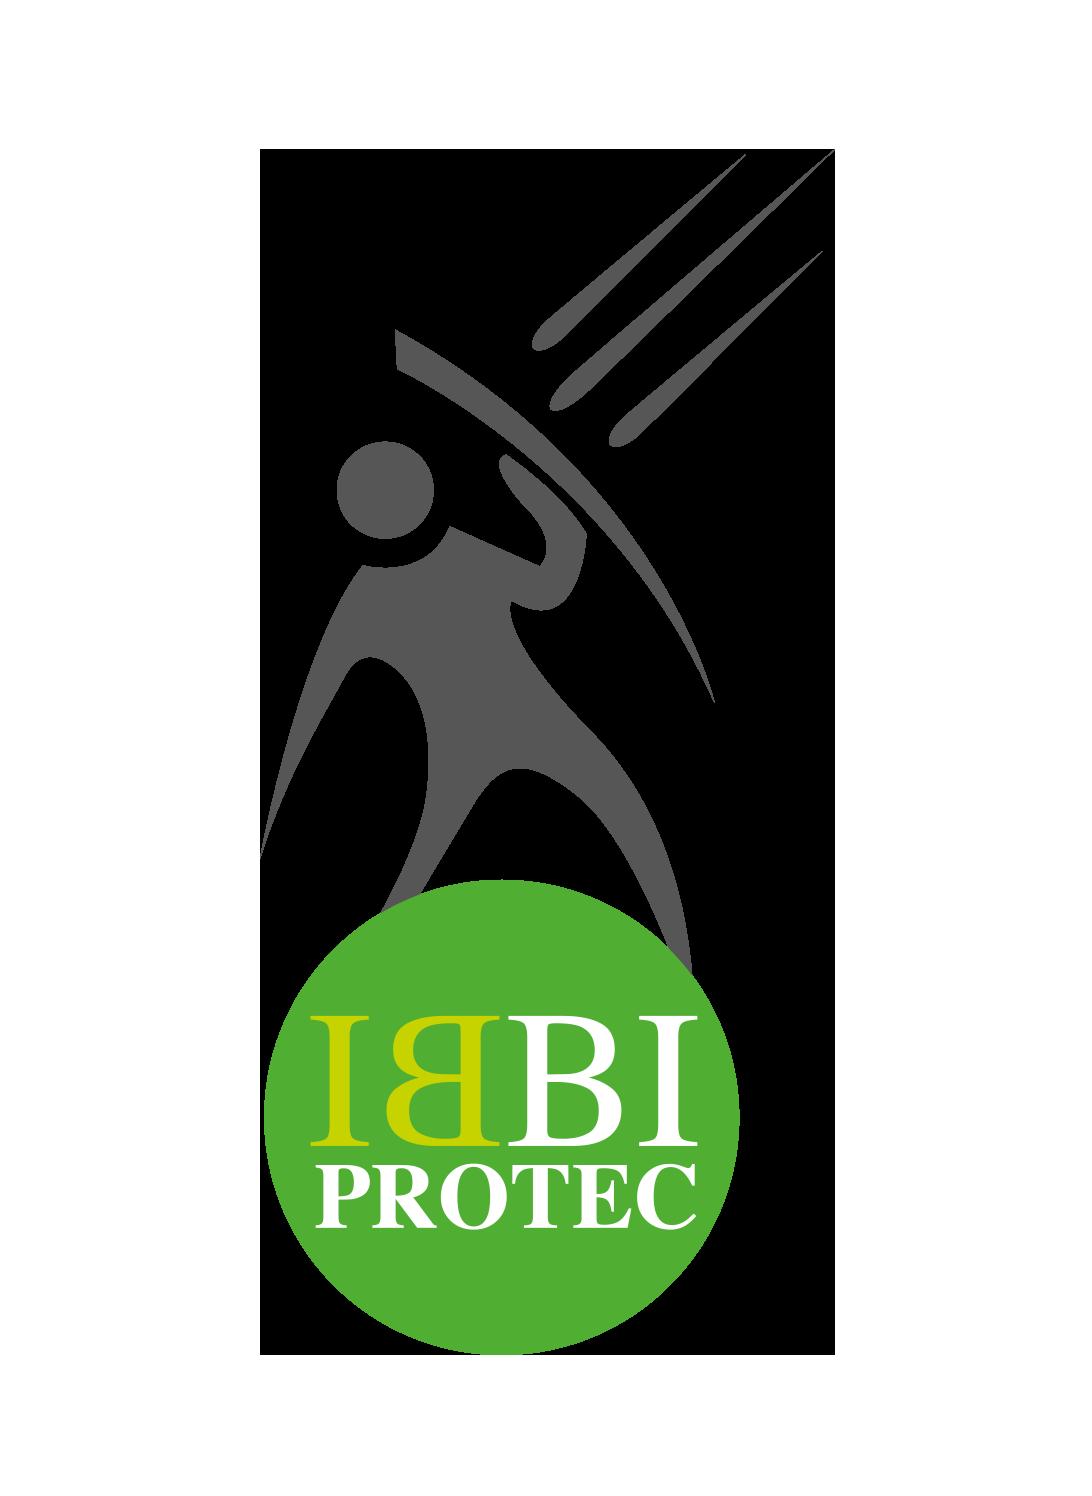 201602-Bi-protec-logo